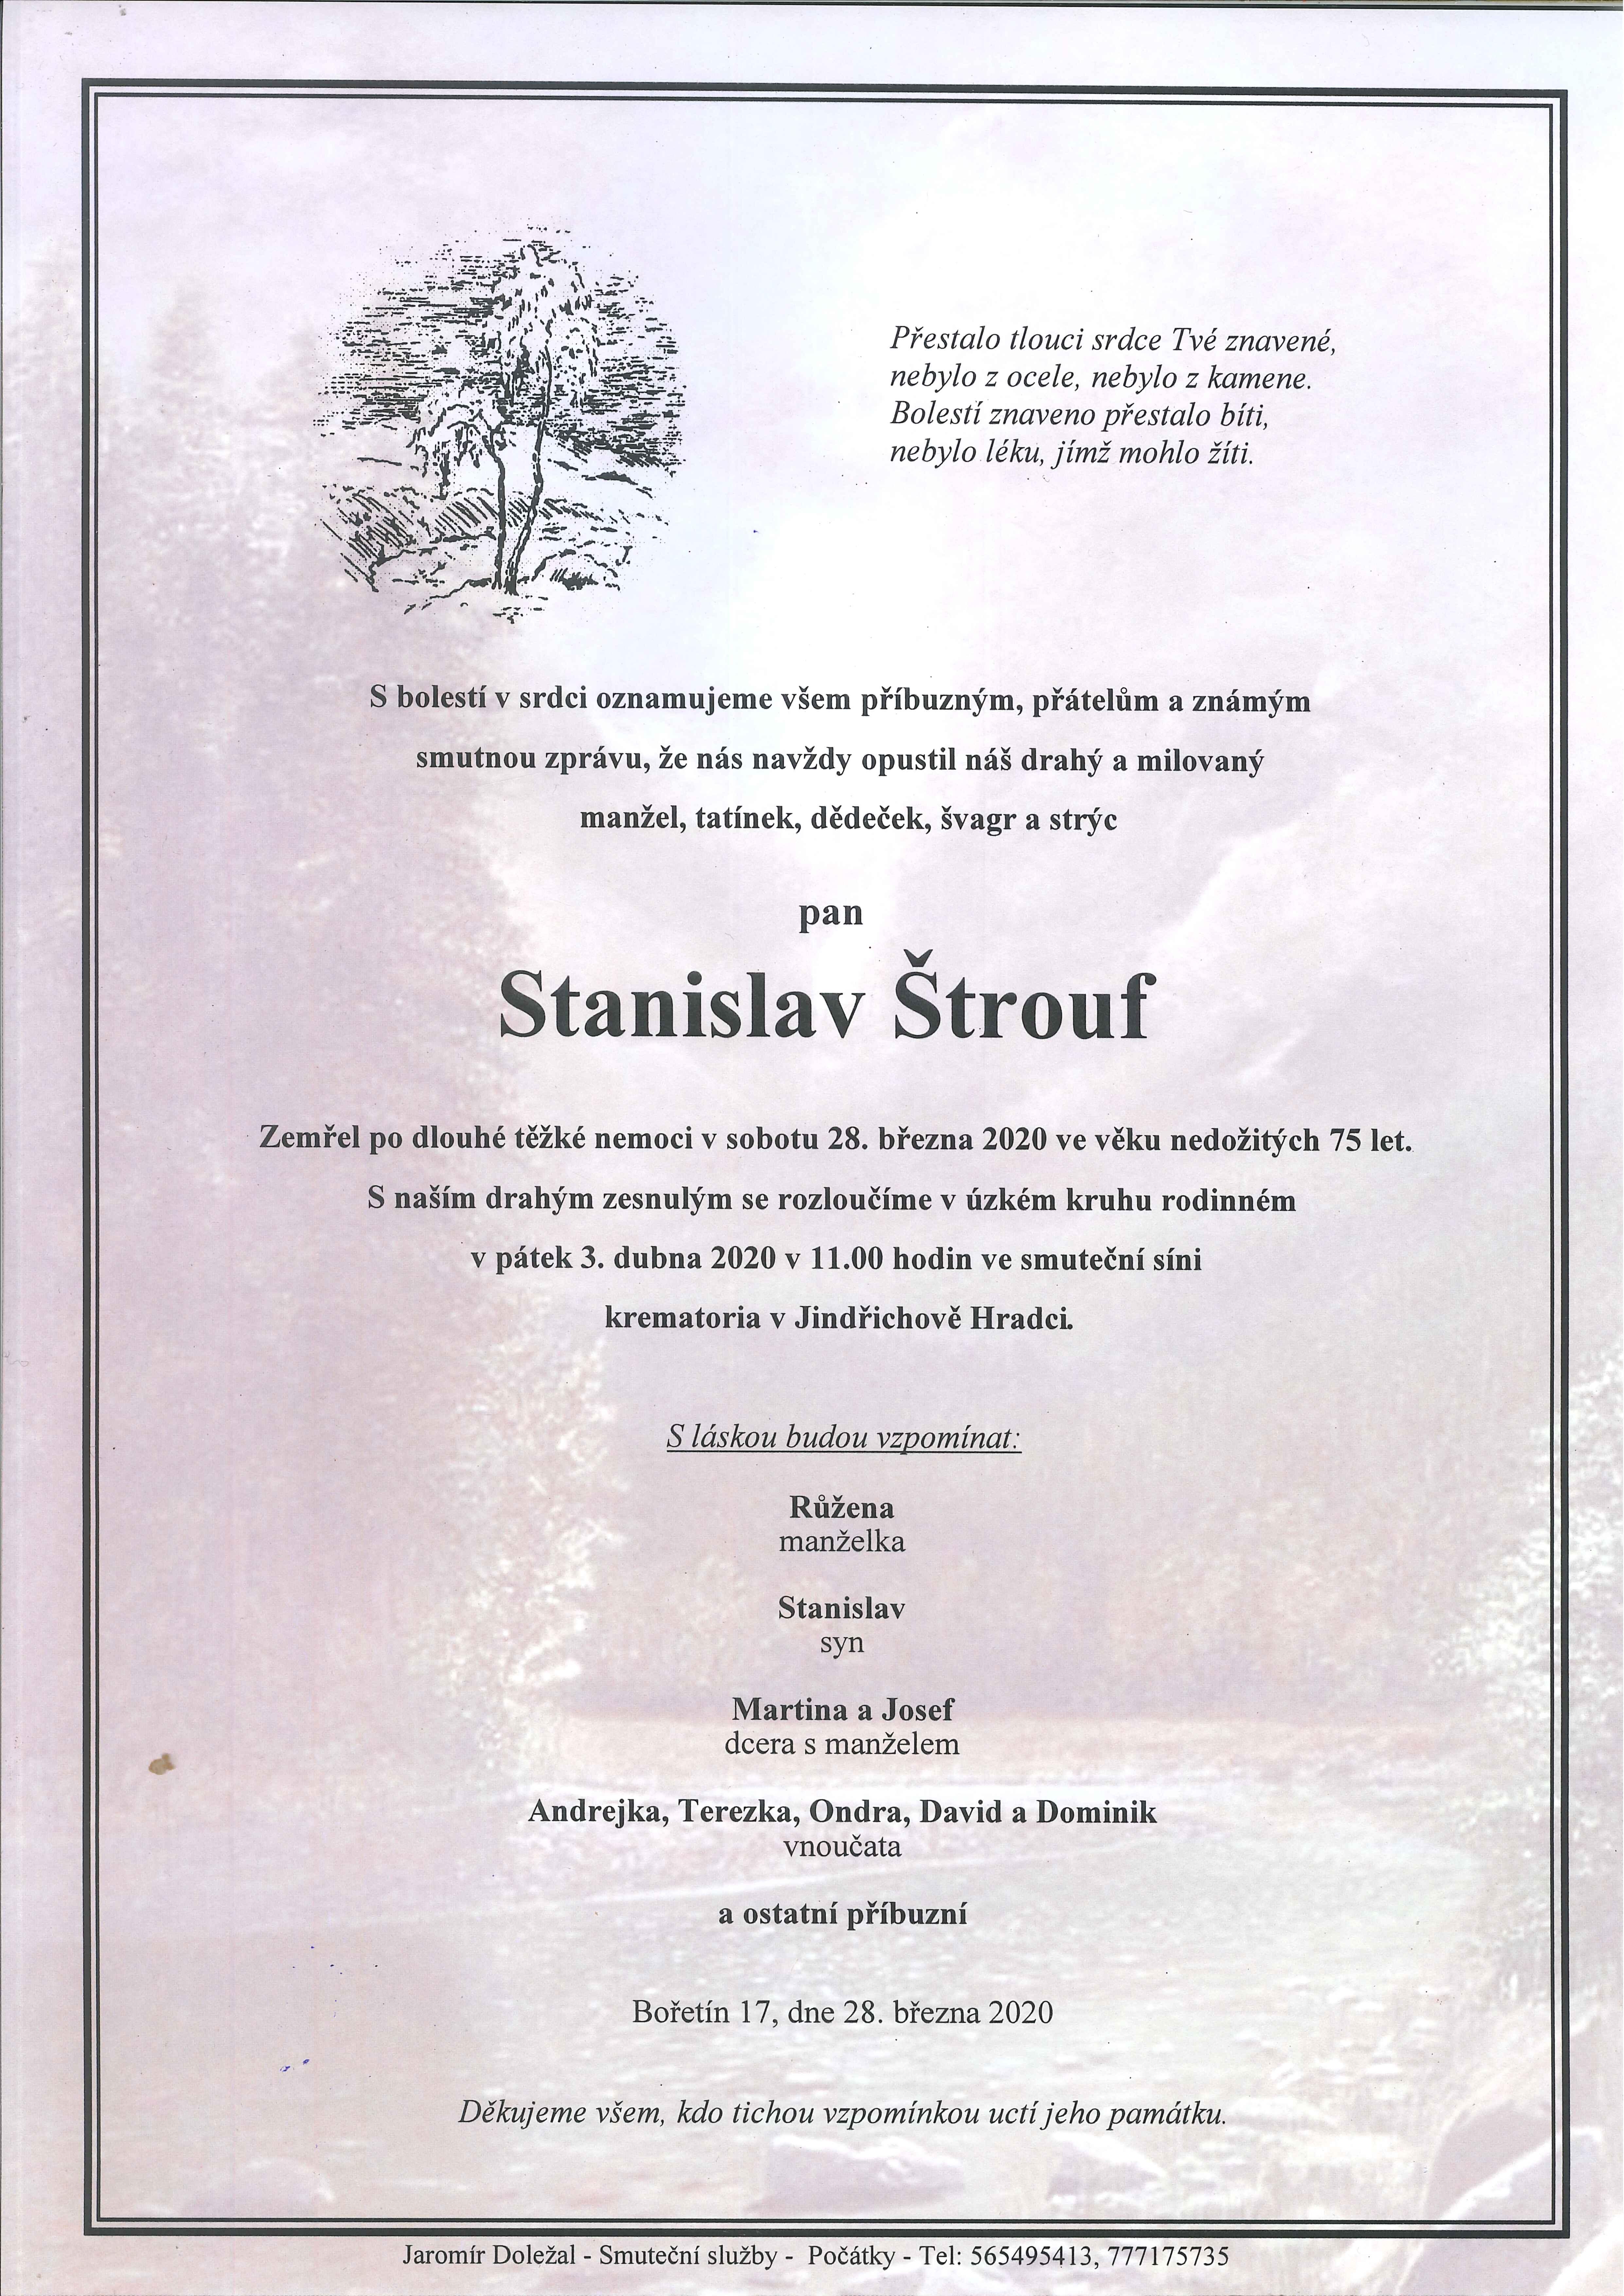 Stanislav Štrouf